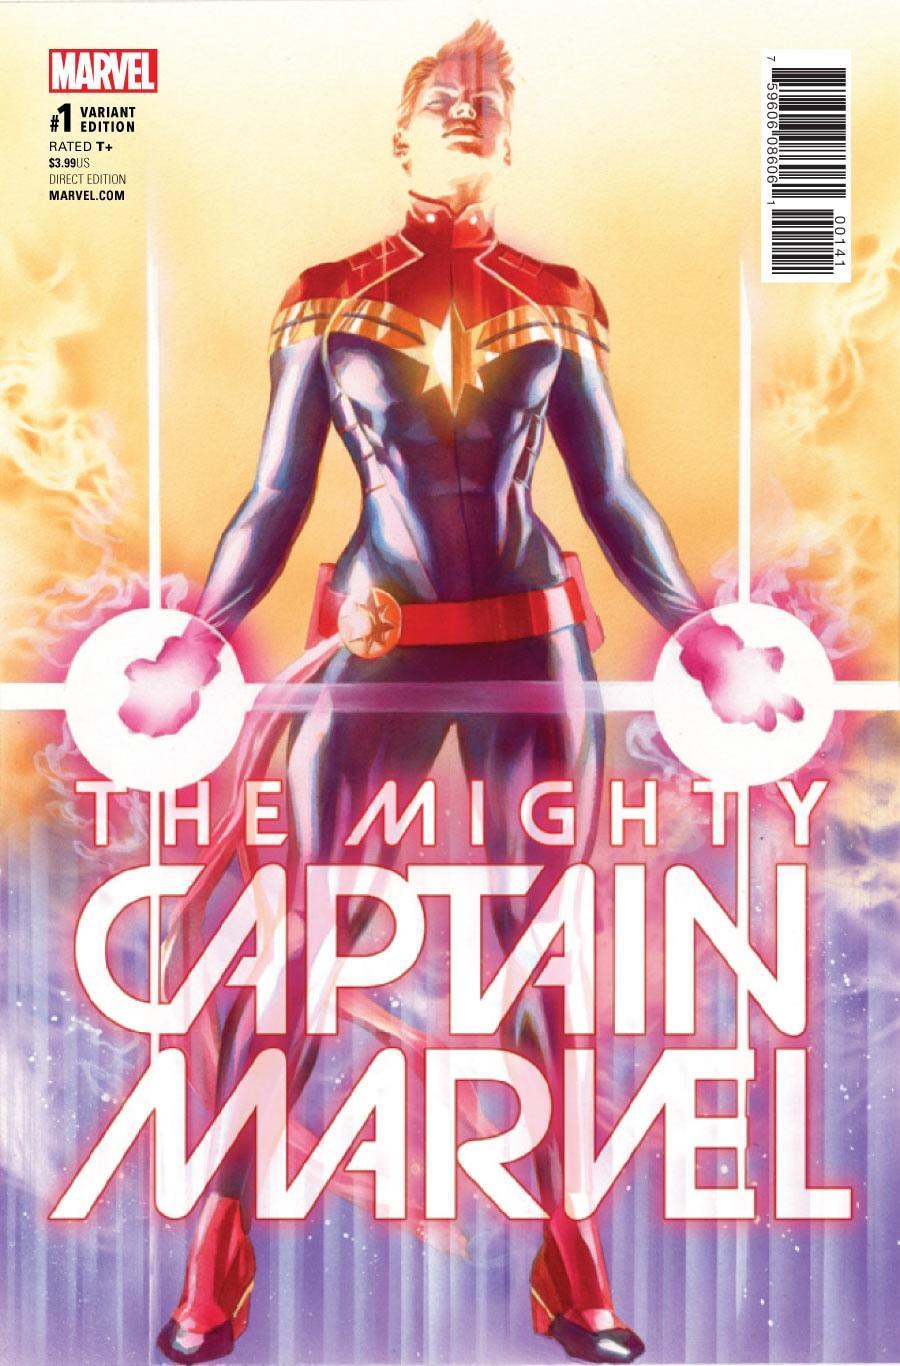 https://vignette.wikia.nocookie.net/marveldatabase/images/9/9c/Mighty_Captain_Marvel_Vol_1_1_Ross_Variant.jpg/revision/latest?cb=20170113145322